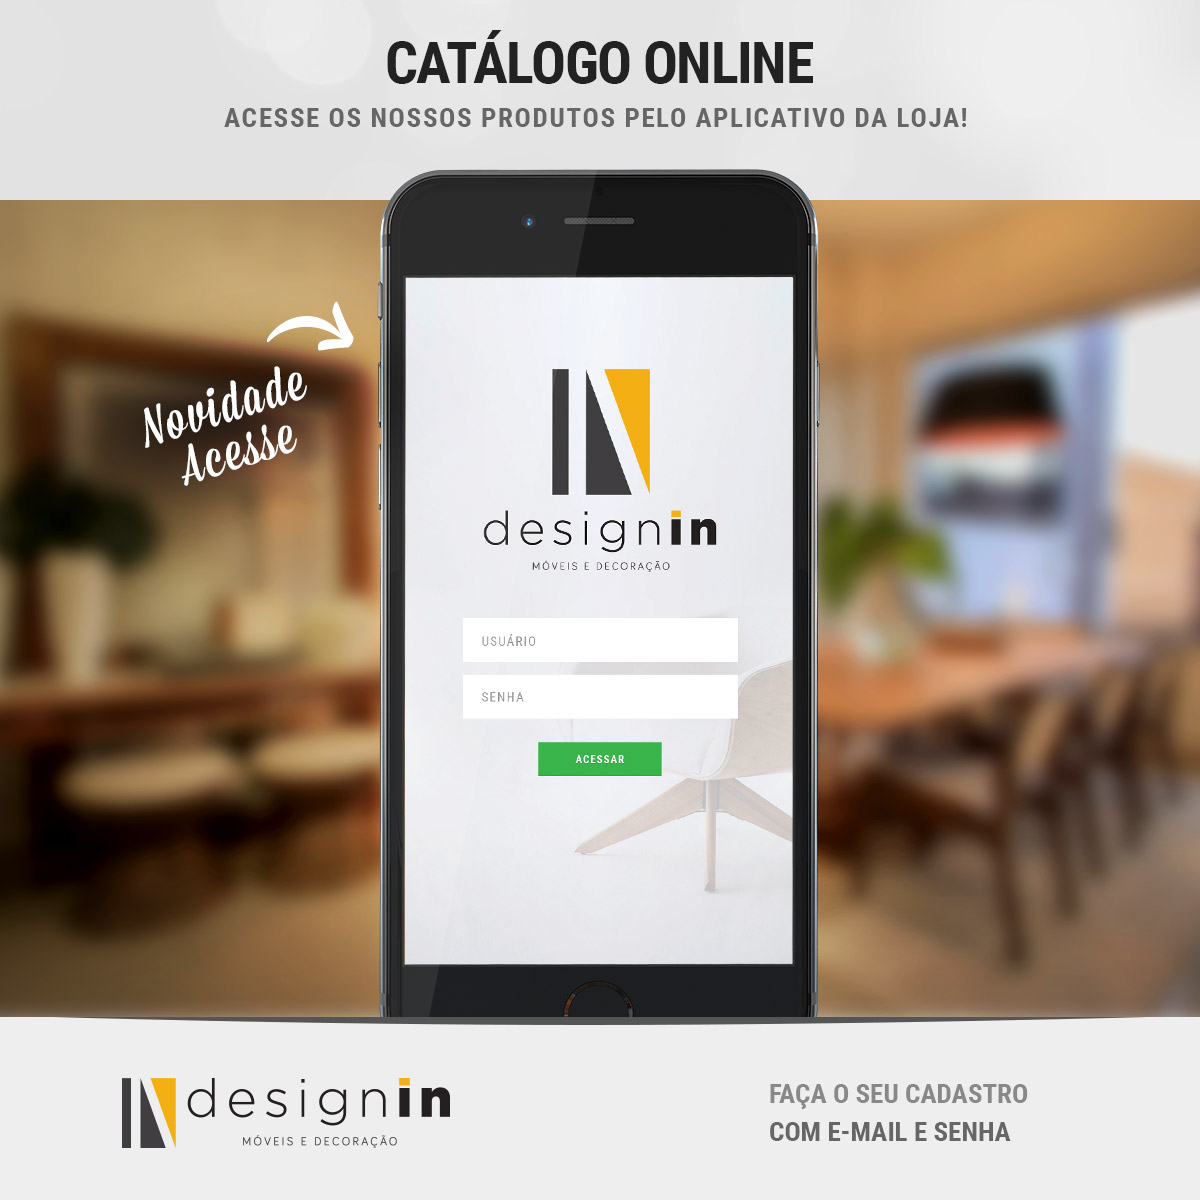 Catálogo Online Designin Store